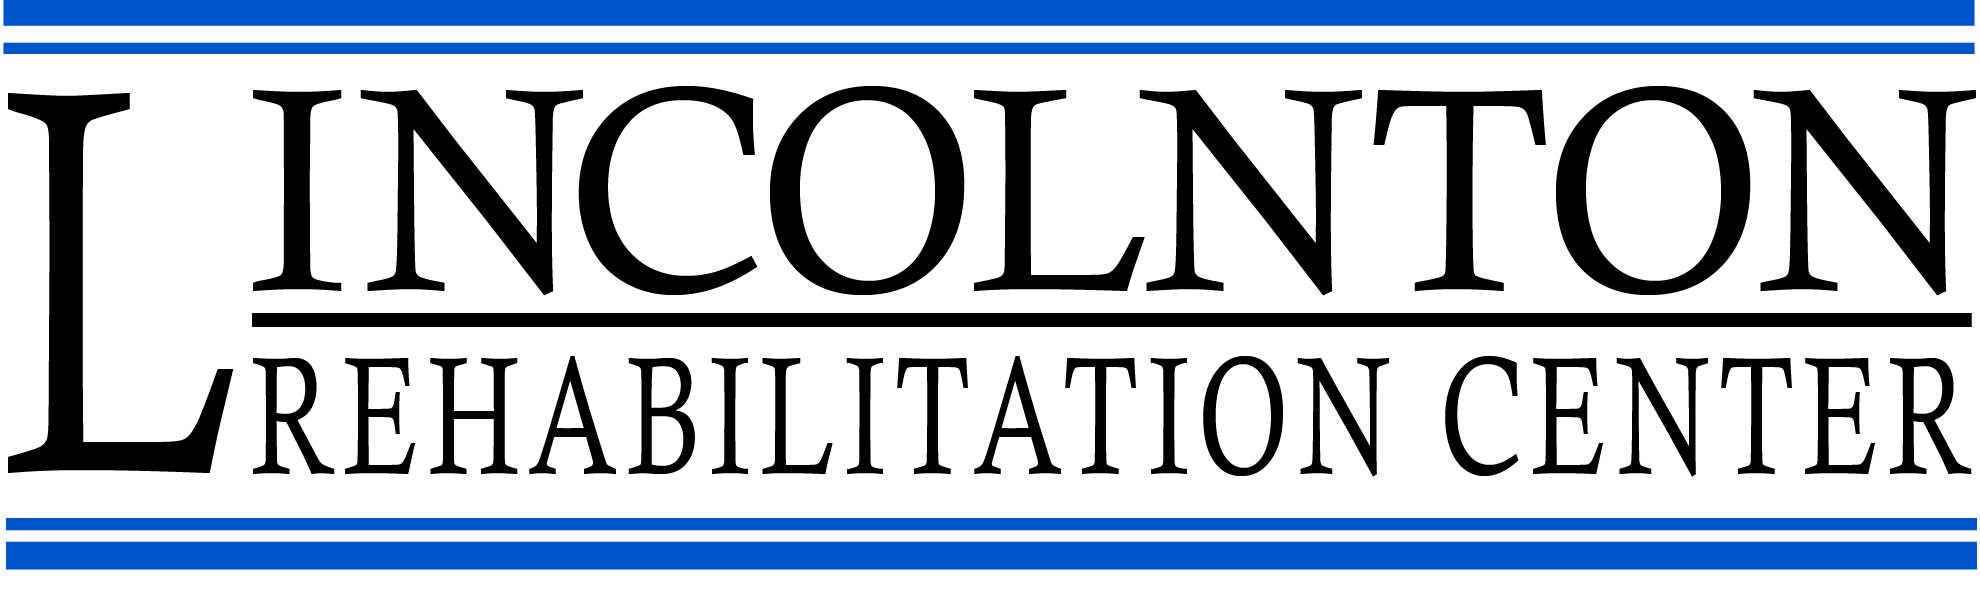 Lincolnton Rehabilitation Center logo